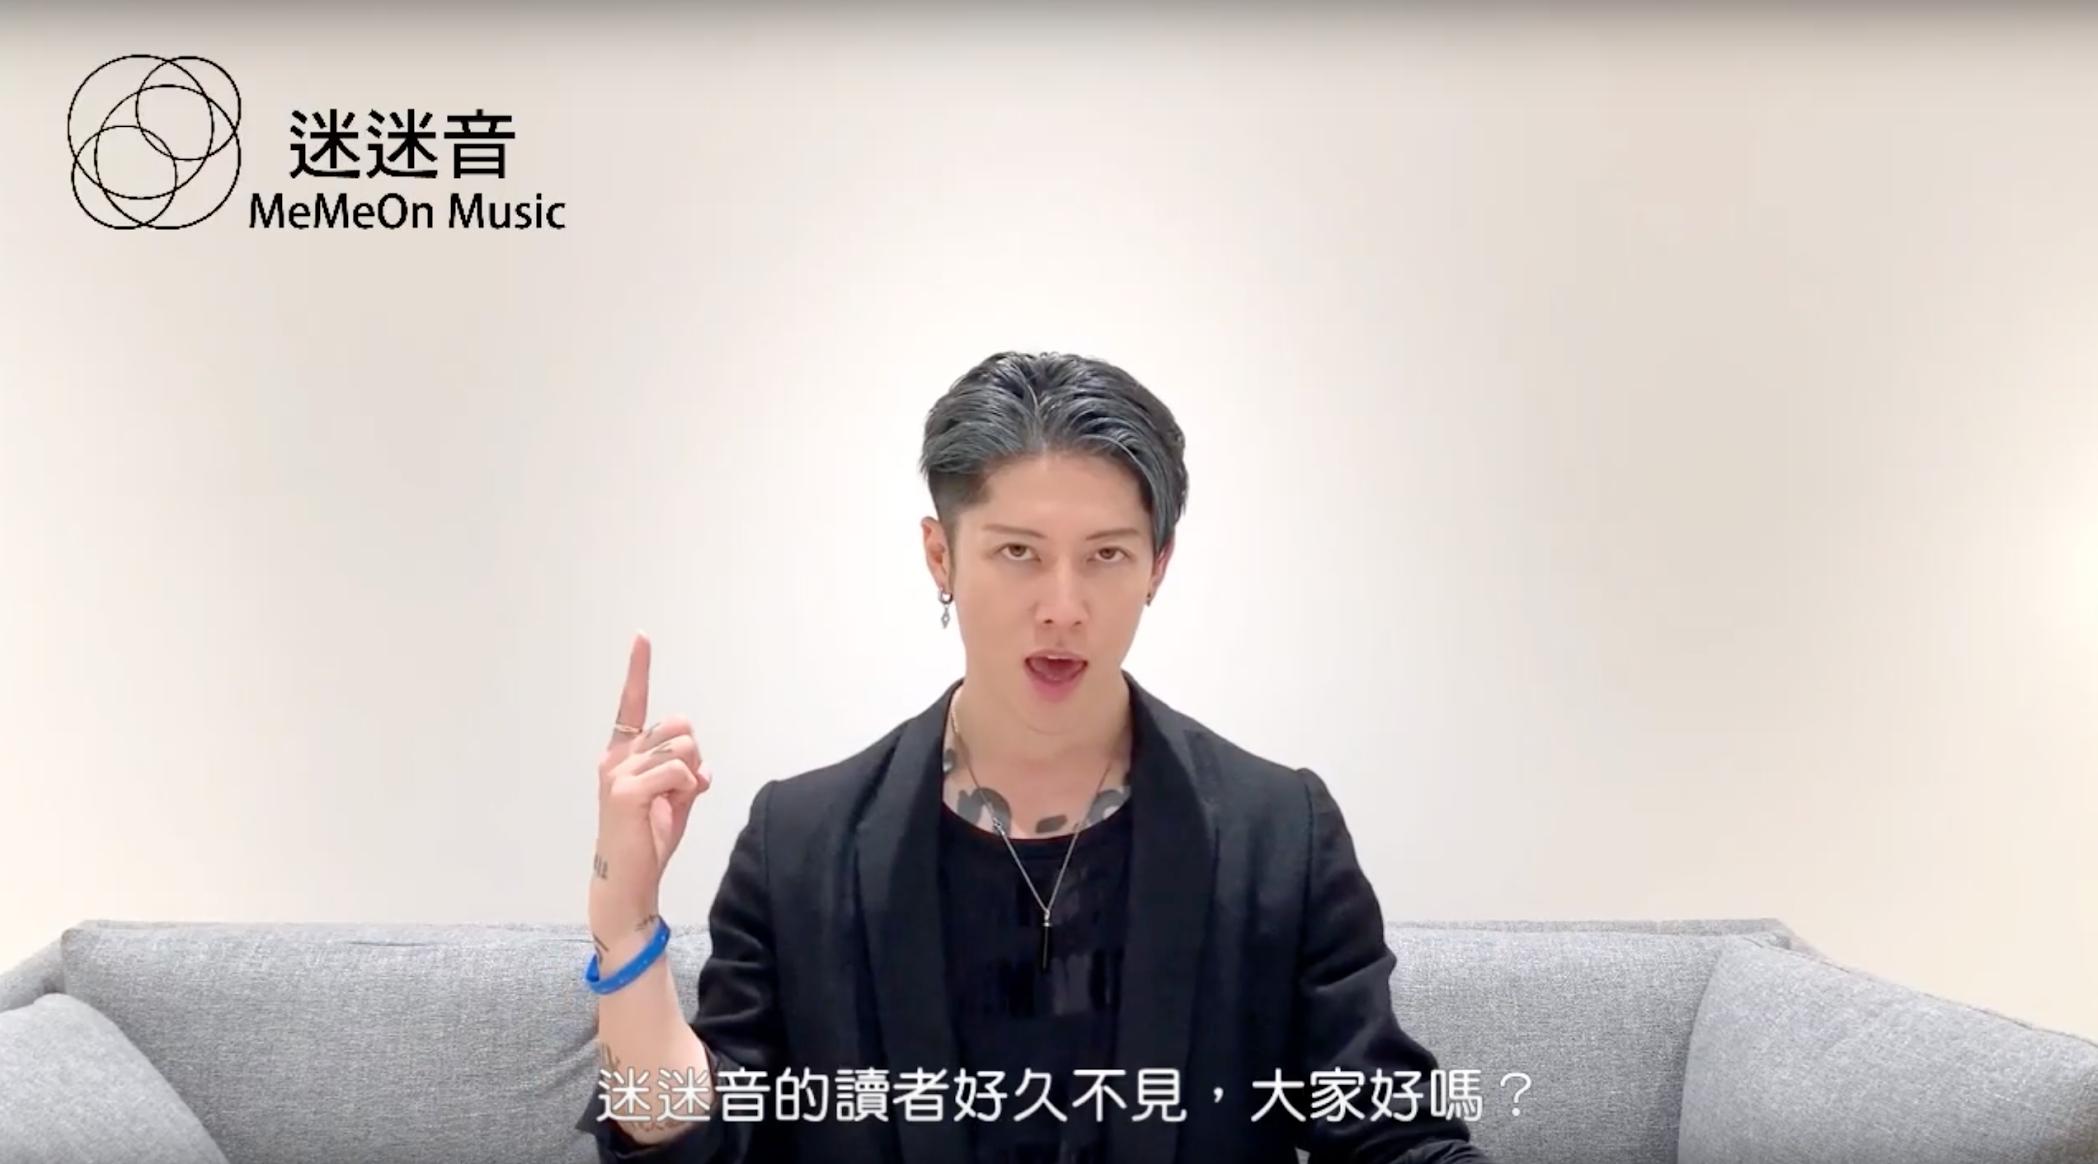 【MeMeOn インタビュー】(動画あり) 進化したサムライギタリスト MIYAVI  新作「NO SLEEP TILL TOKYO」を語る